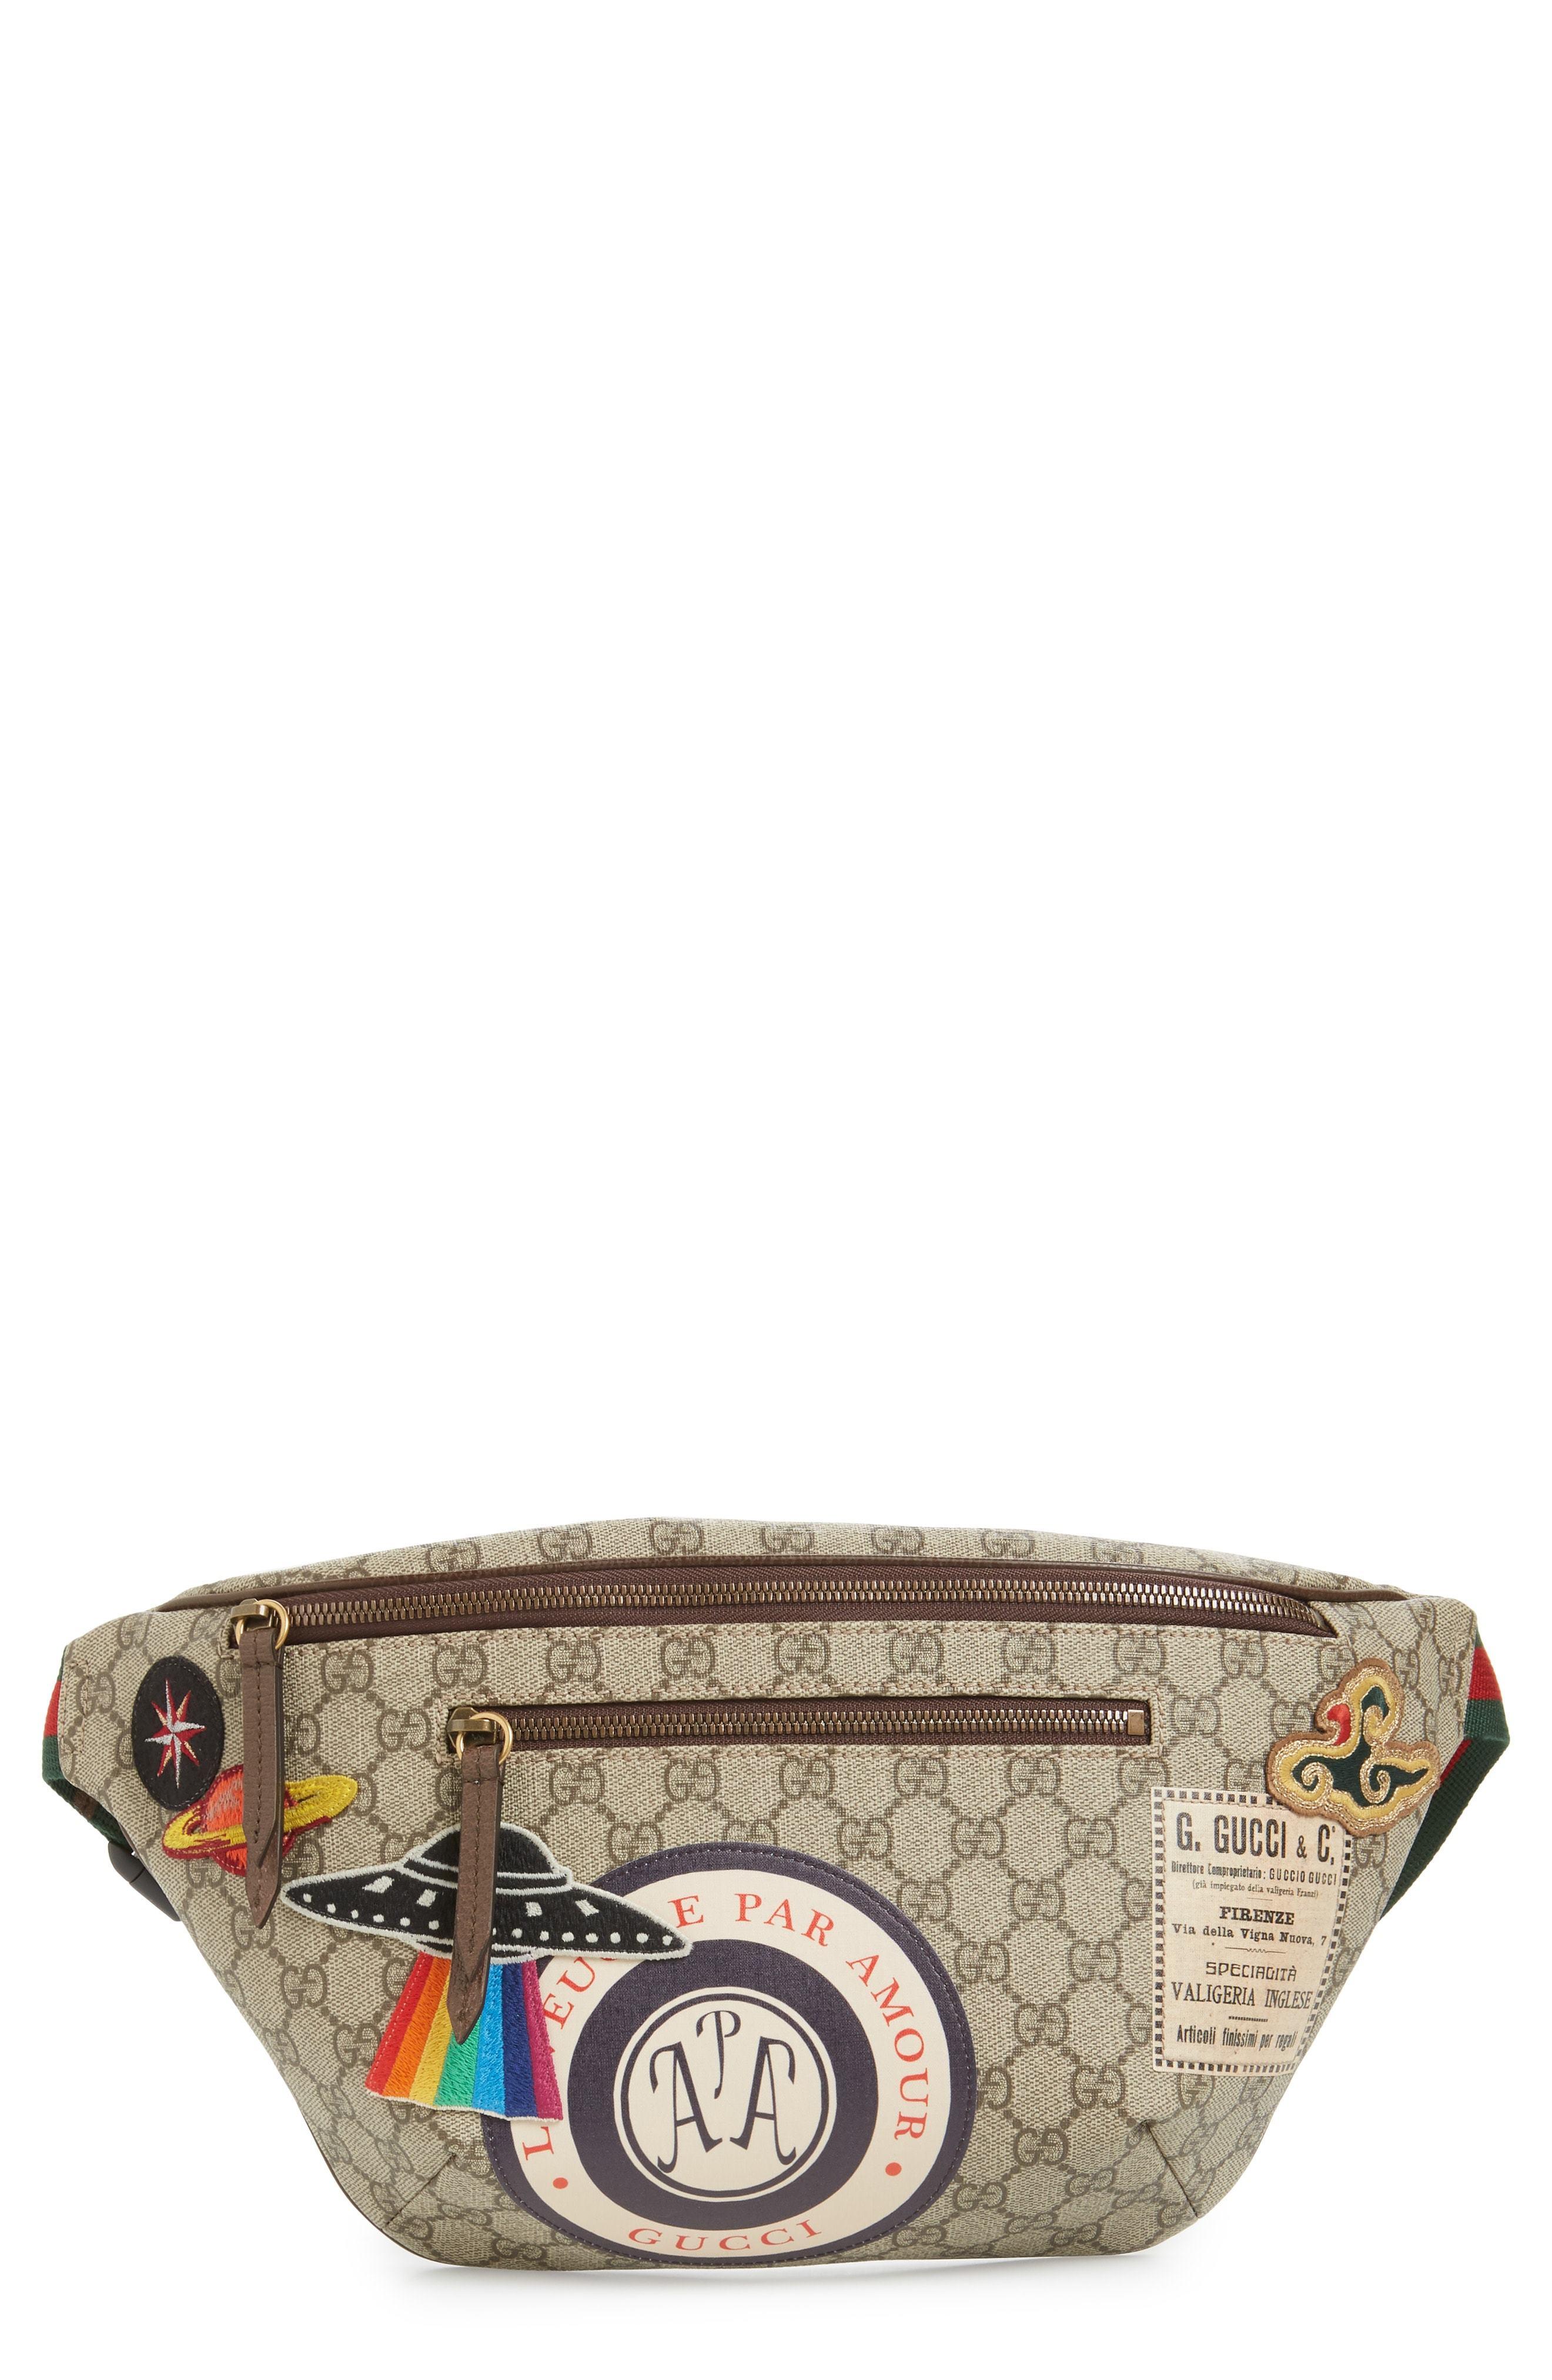 437b3919f97 ... Gucci Gg Supreme Waist Pack